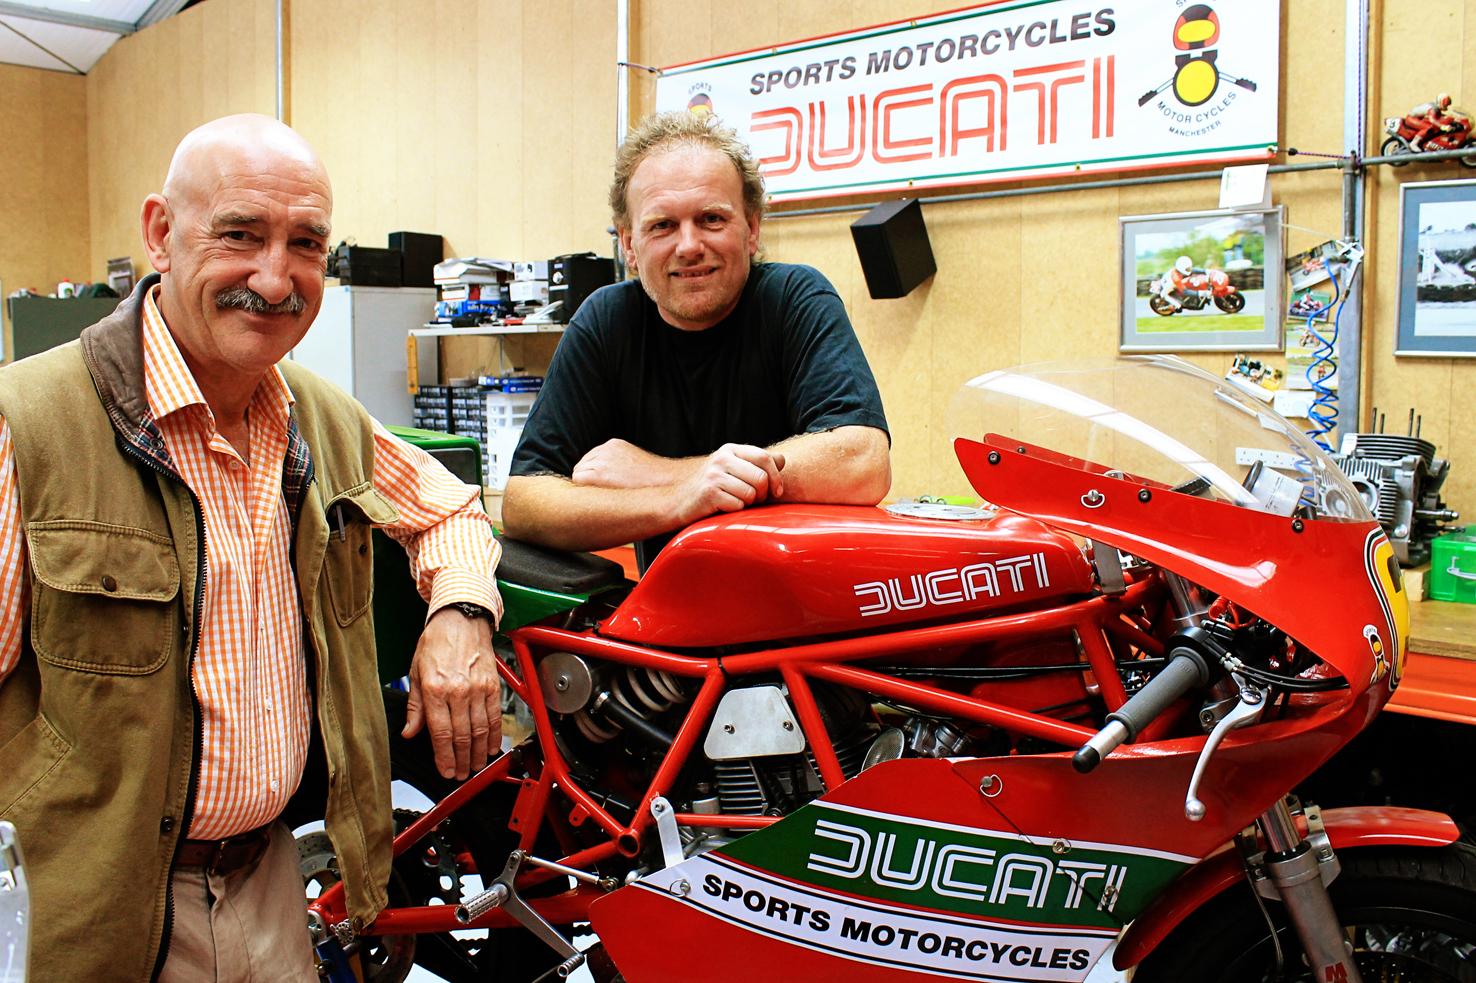 sports-motorcycles-1.jpg